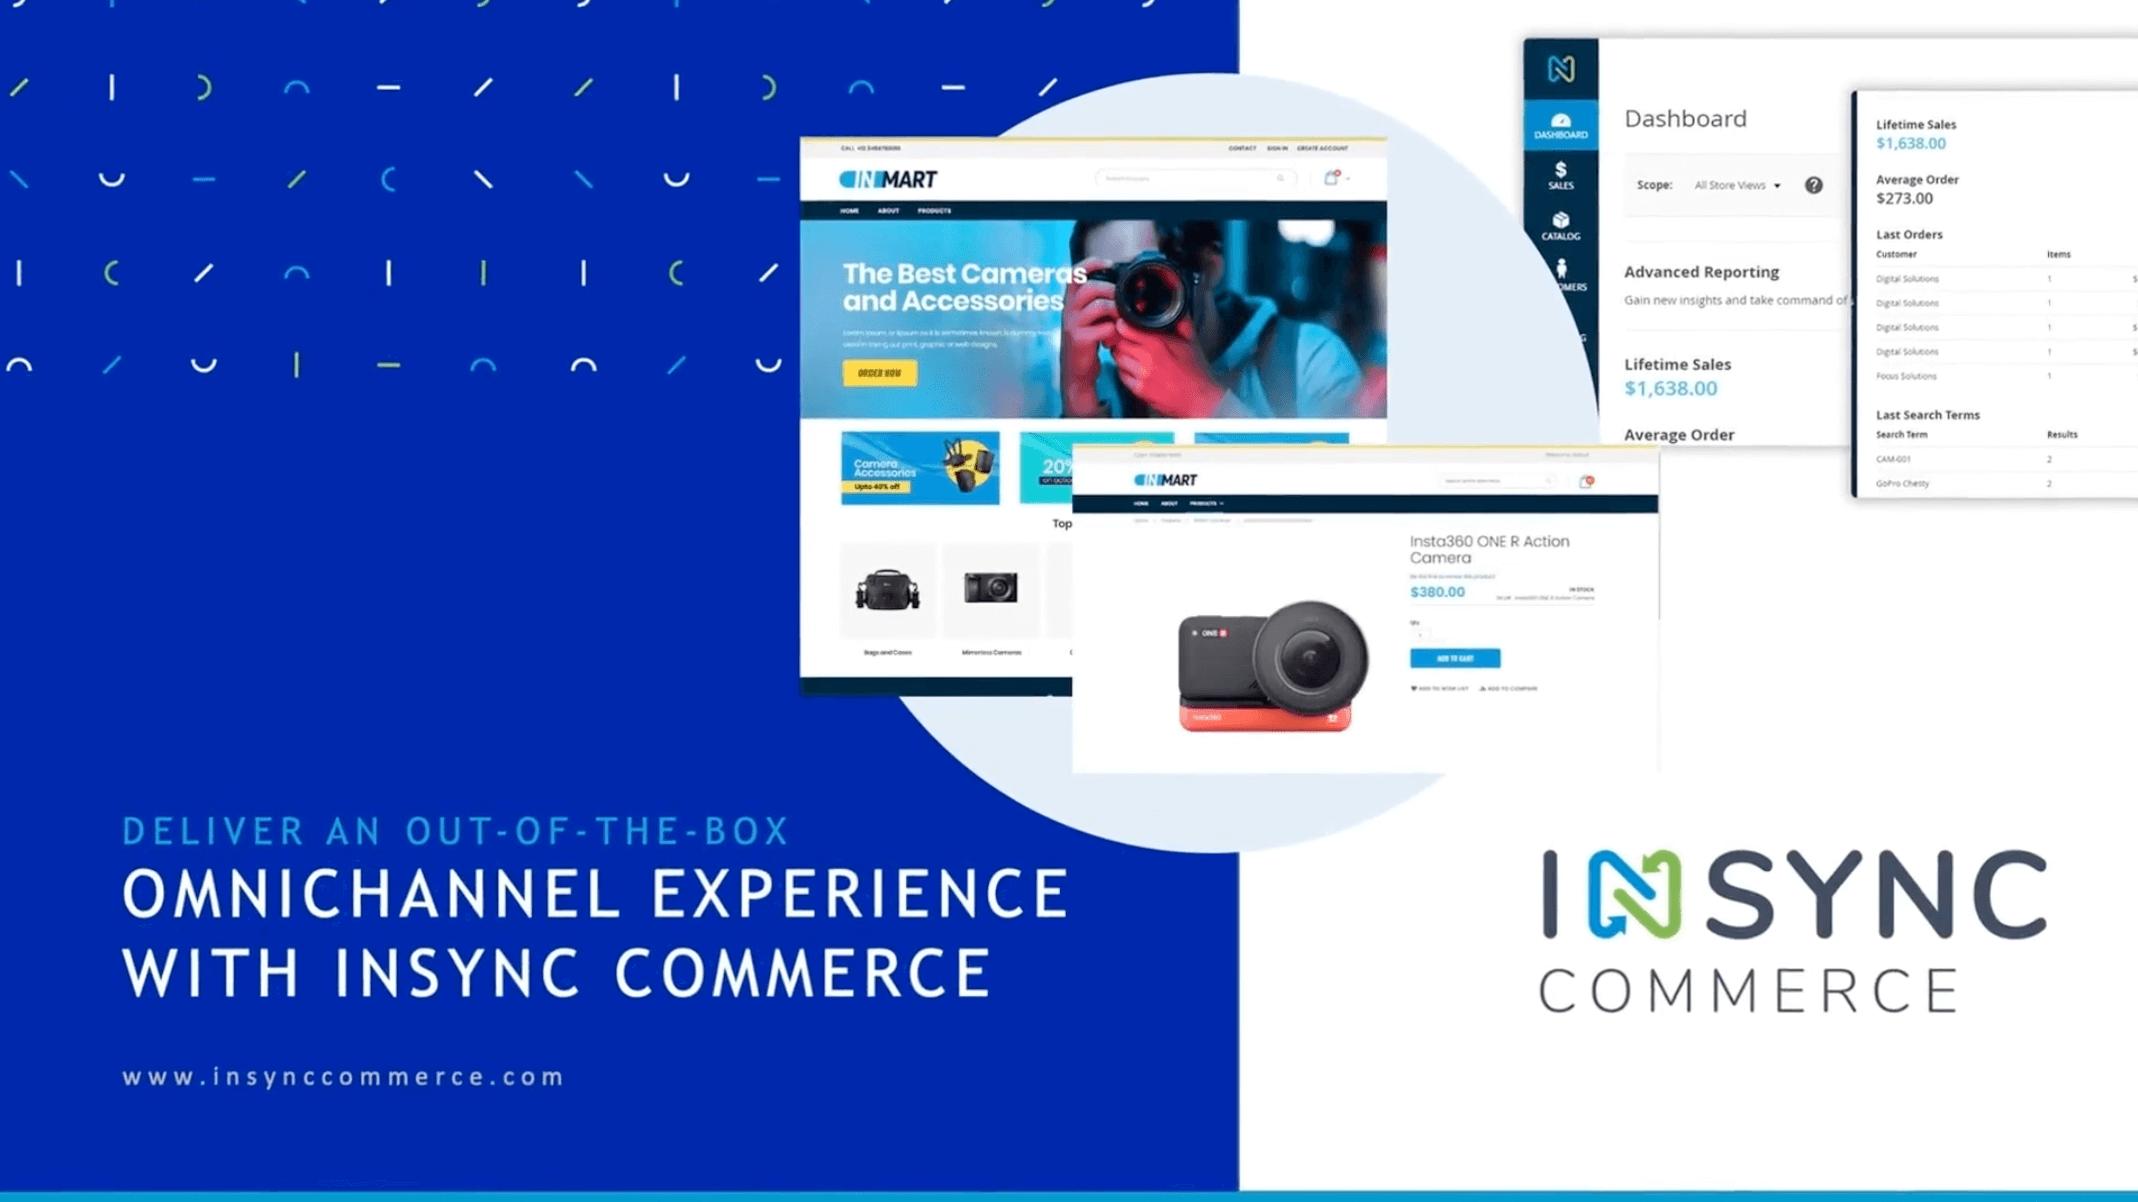 insync-commerce-launch-insync-2020